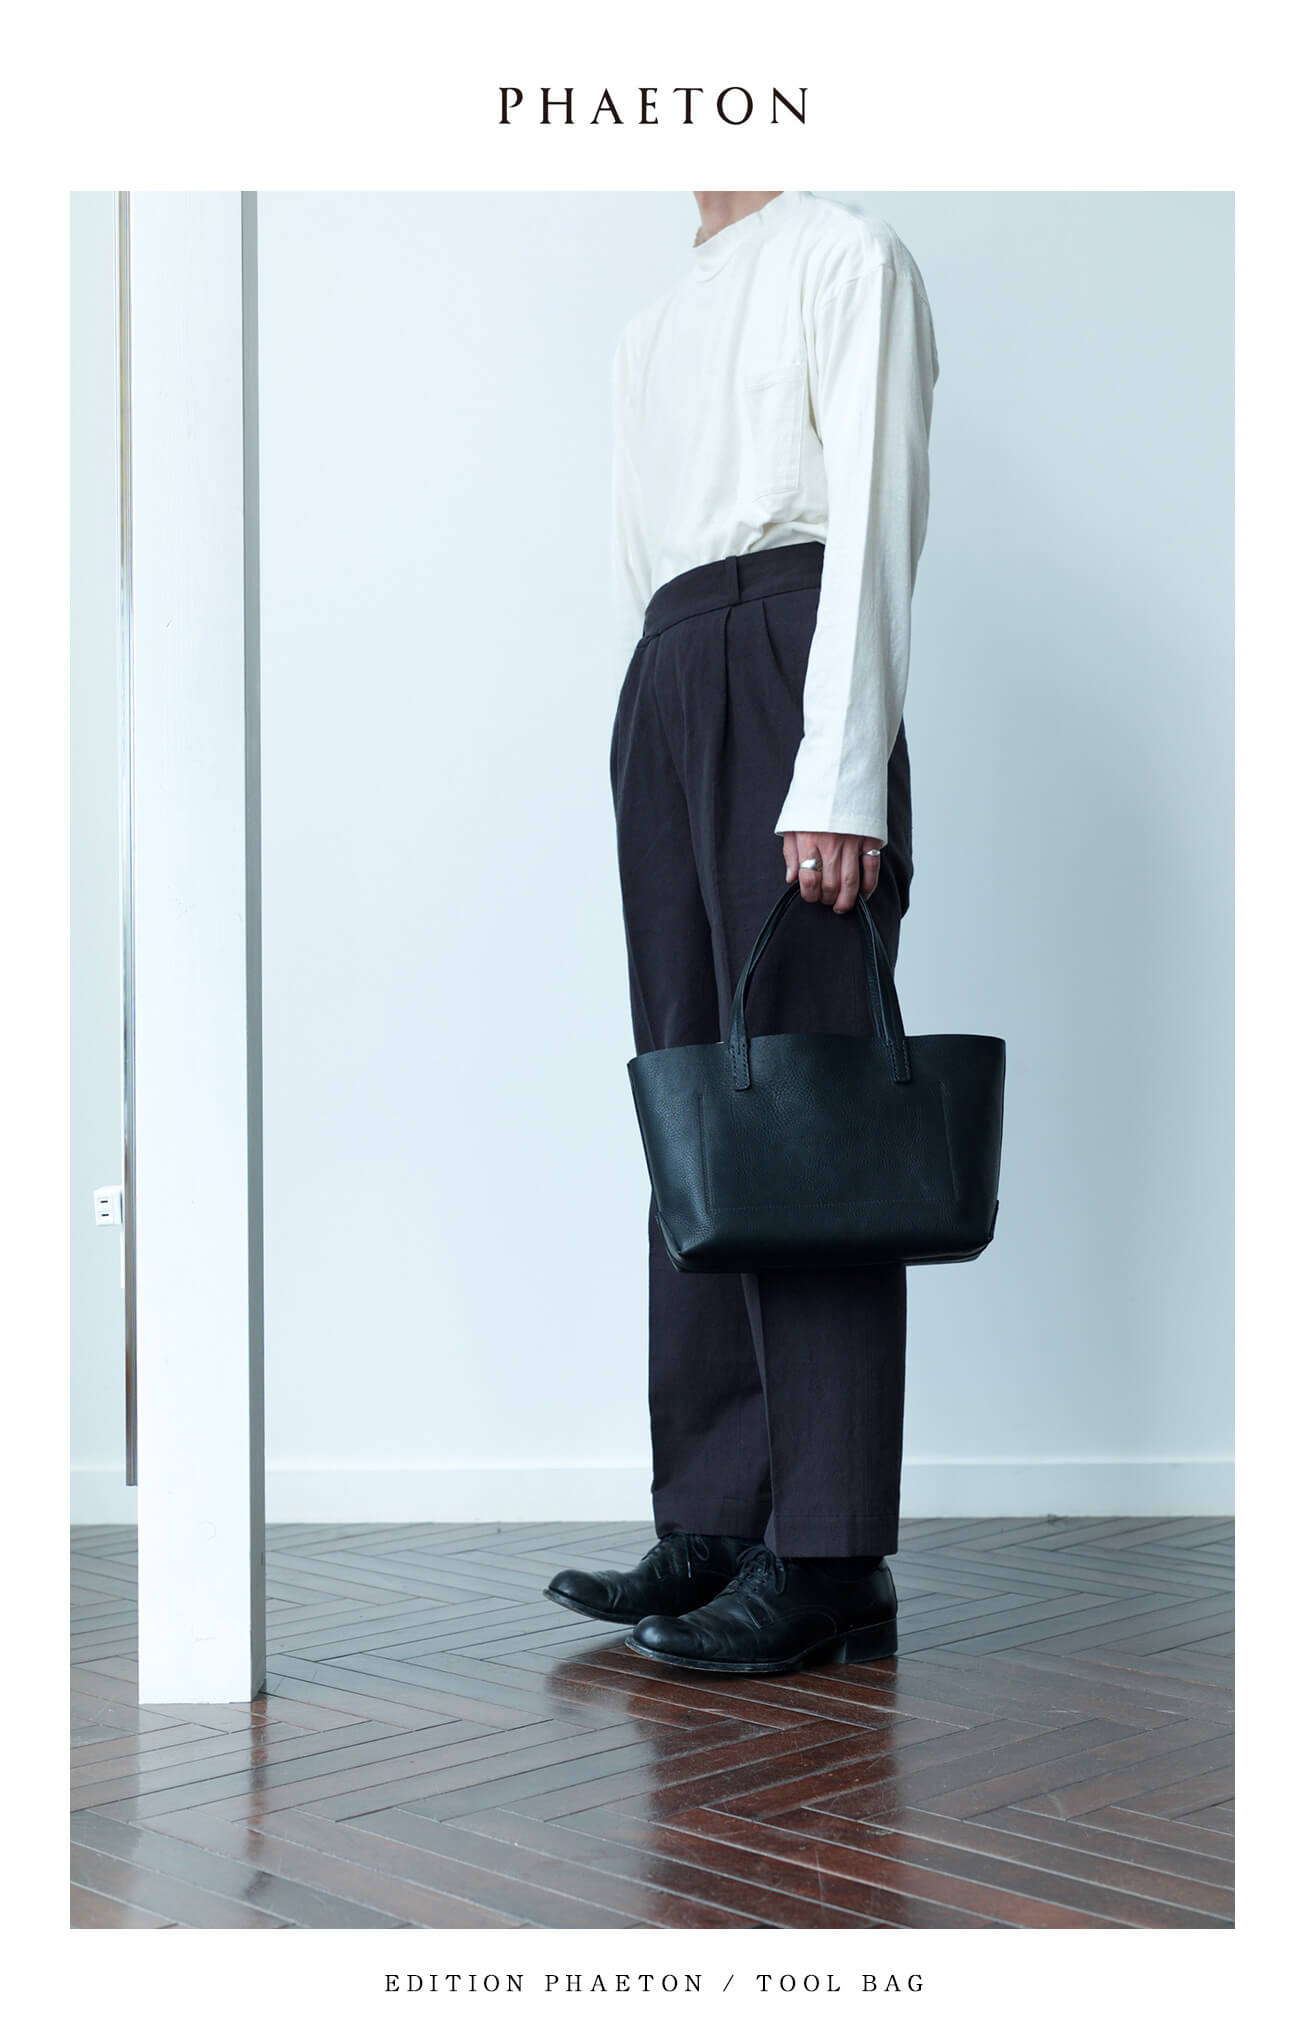 editionphaeton-toolbag04